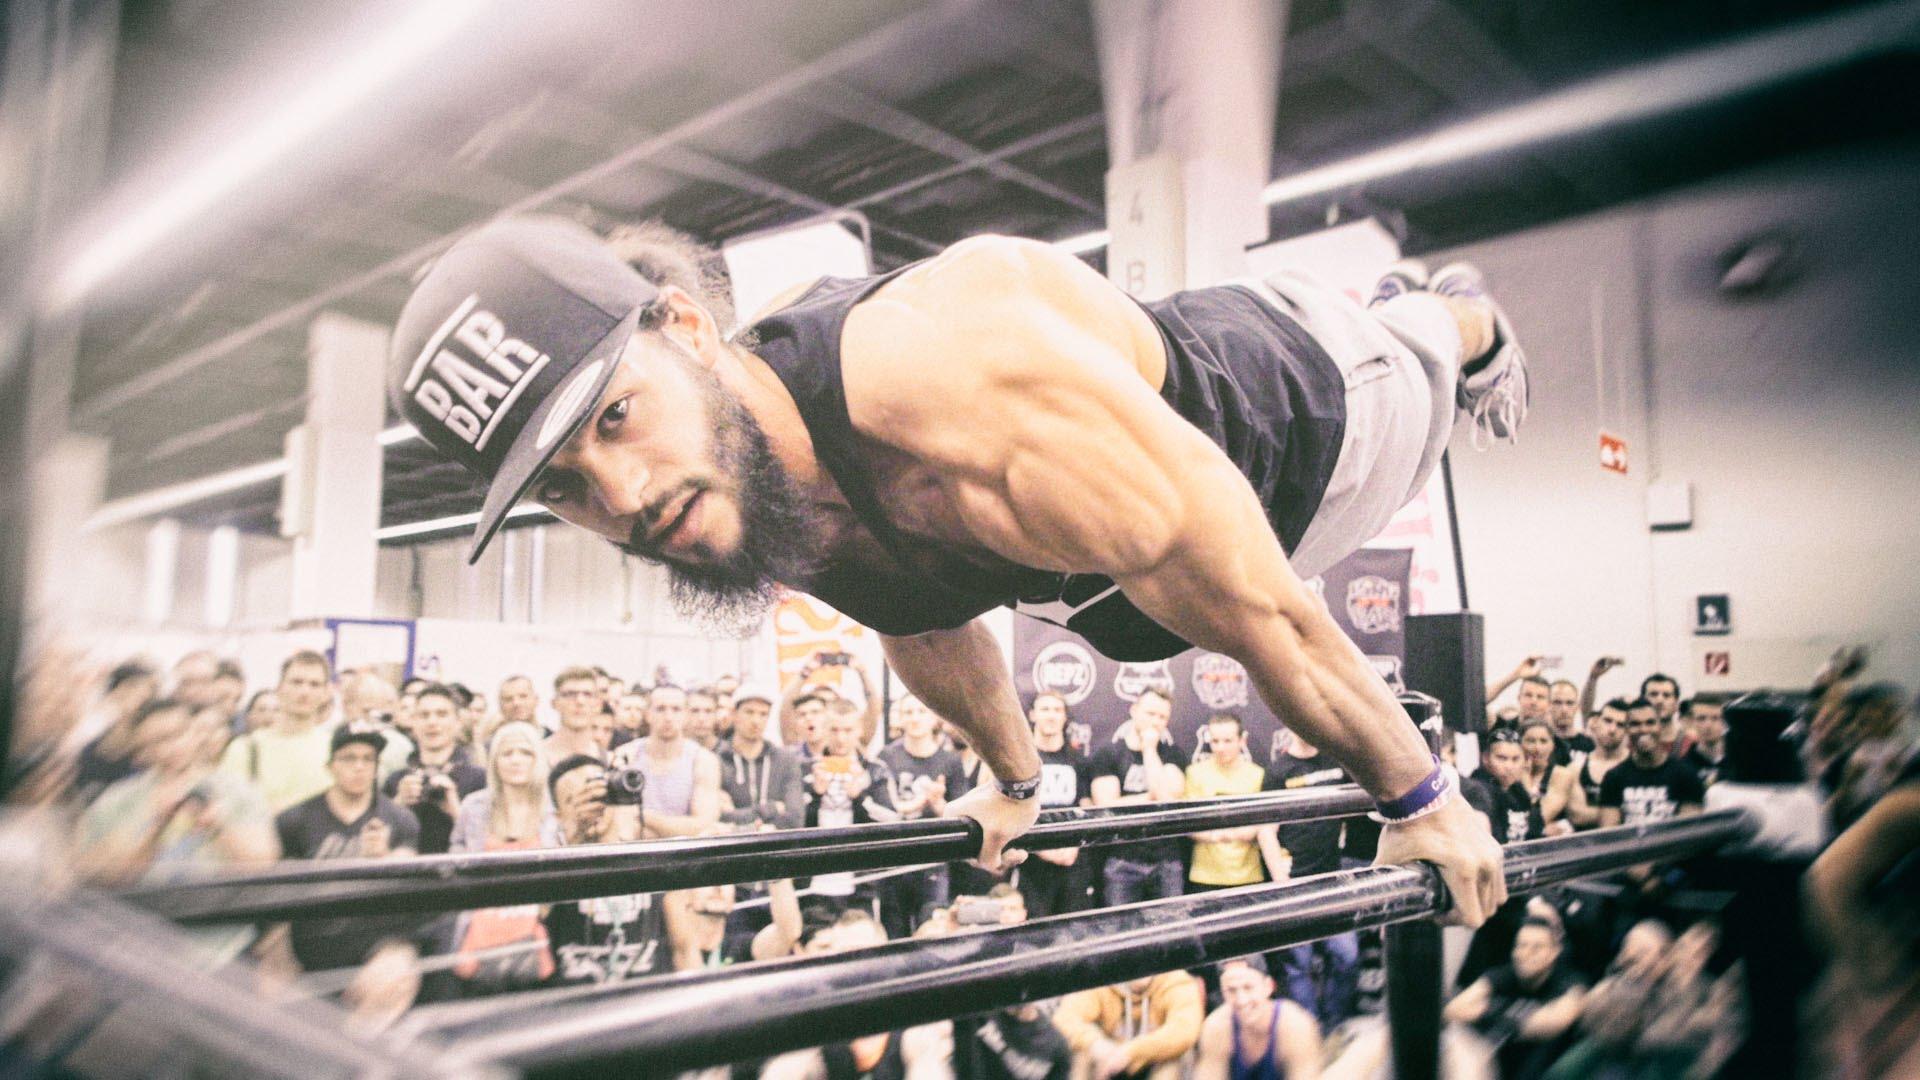 Workout Wallpaper Hd King Of The Bar 2015 Ultimate Calisthenics Battle